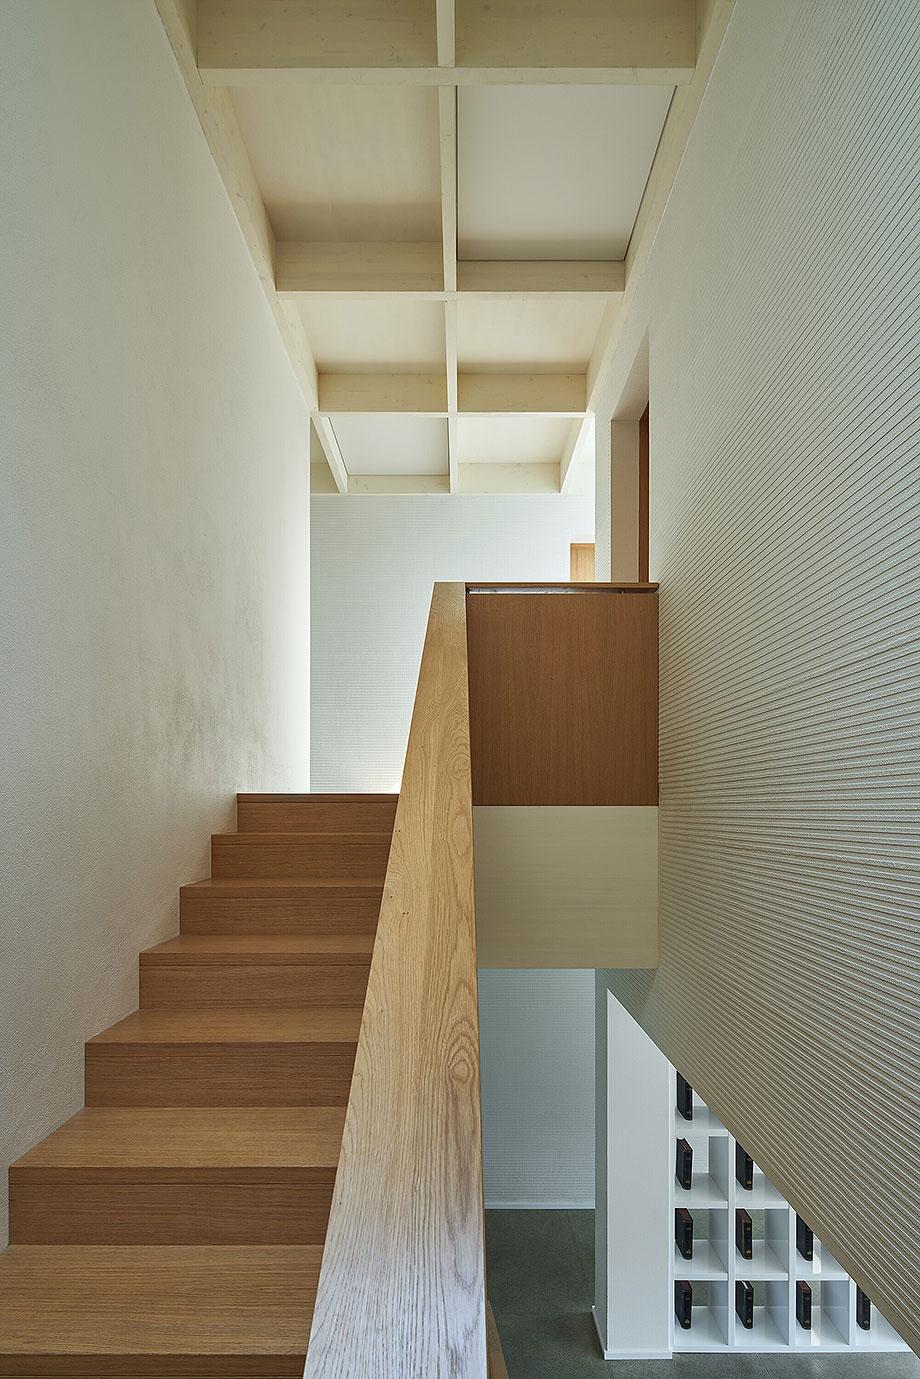 casa lhotka en praga de soa architekti y richter design (10) - foto boysplaynice